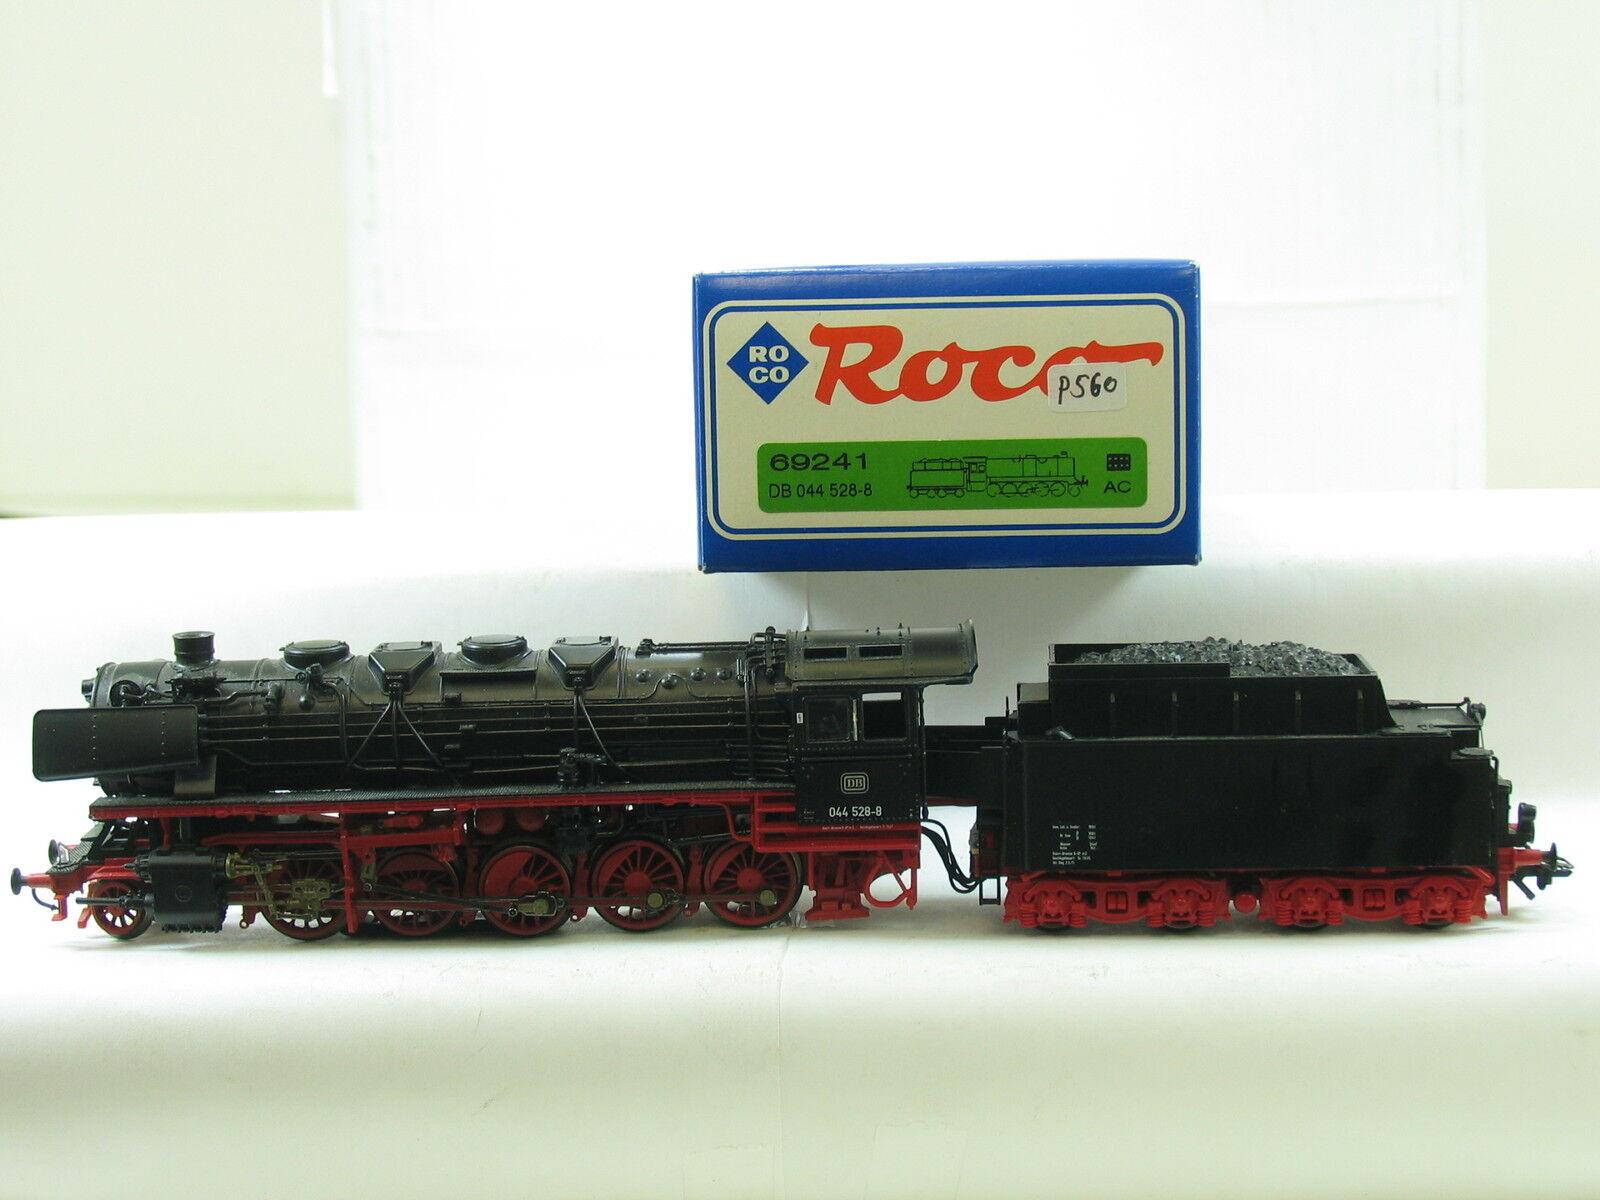 Roco h0 AC 69241 Steam Locomotive BR 44 528-8 DB OP (y1901)